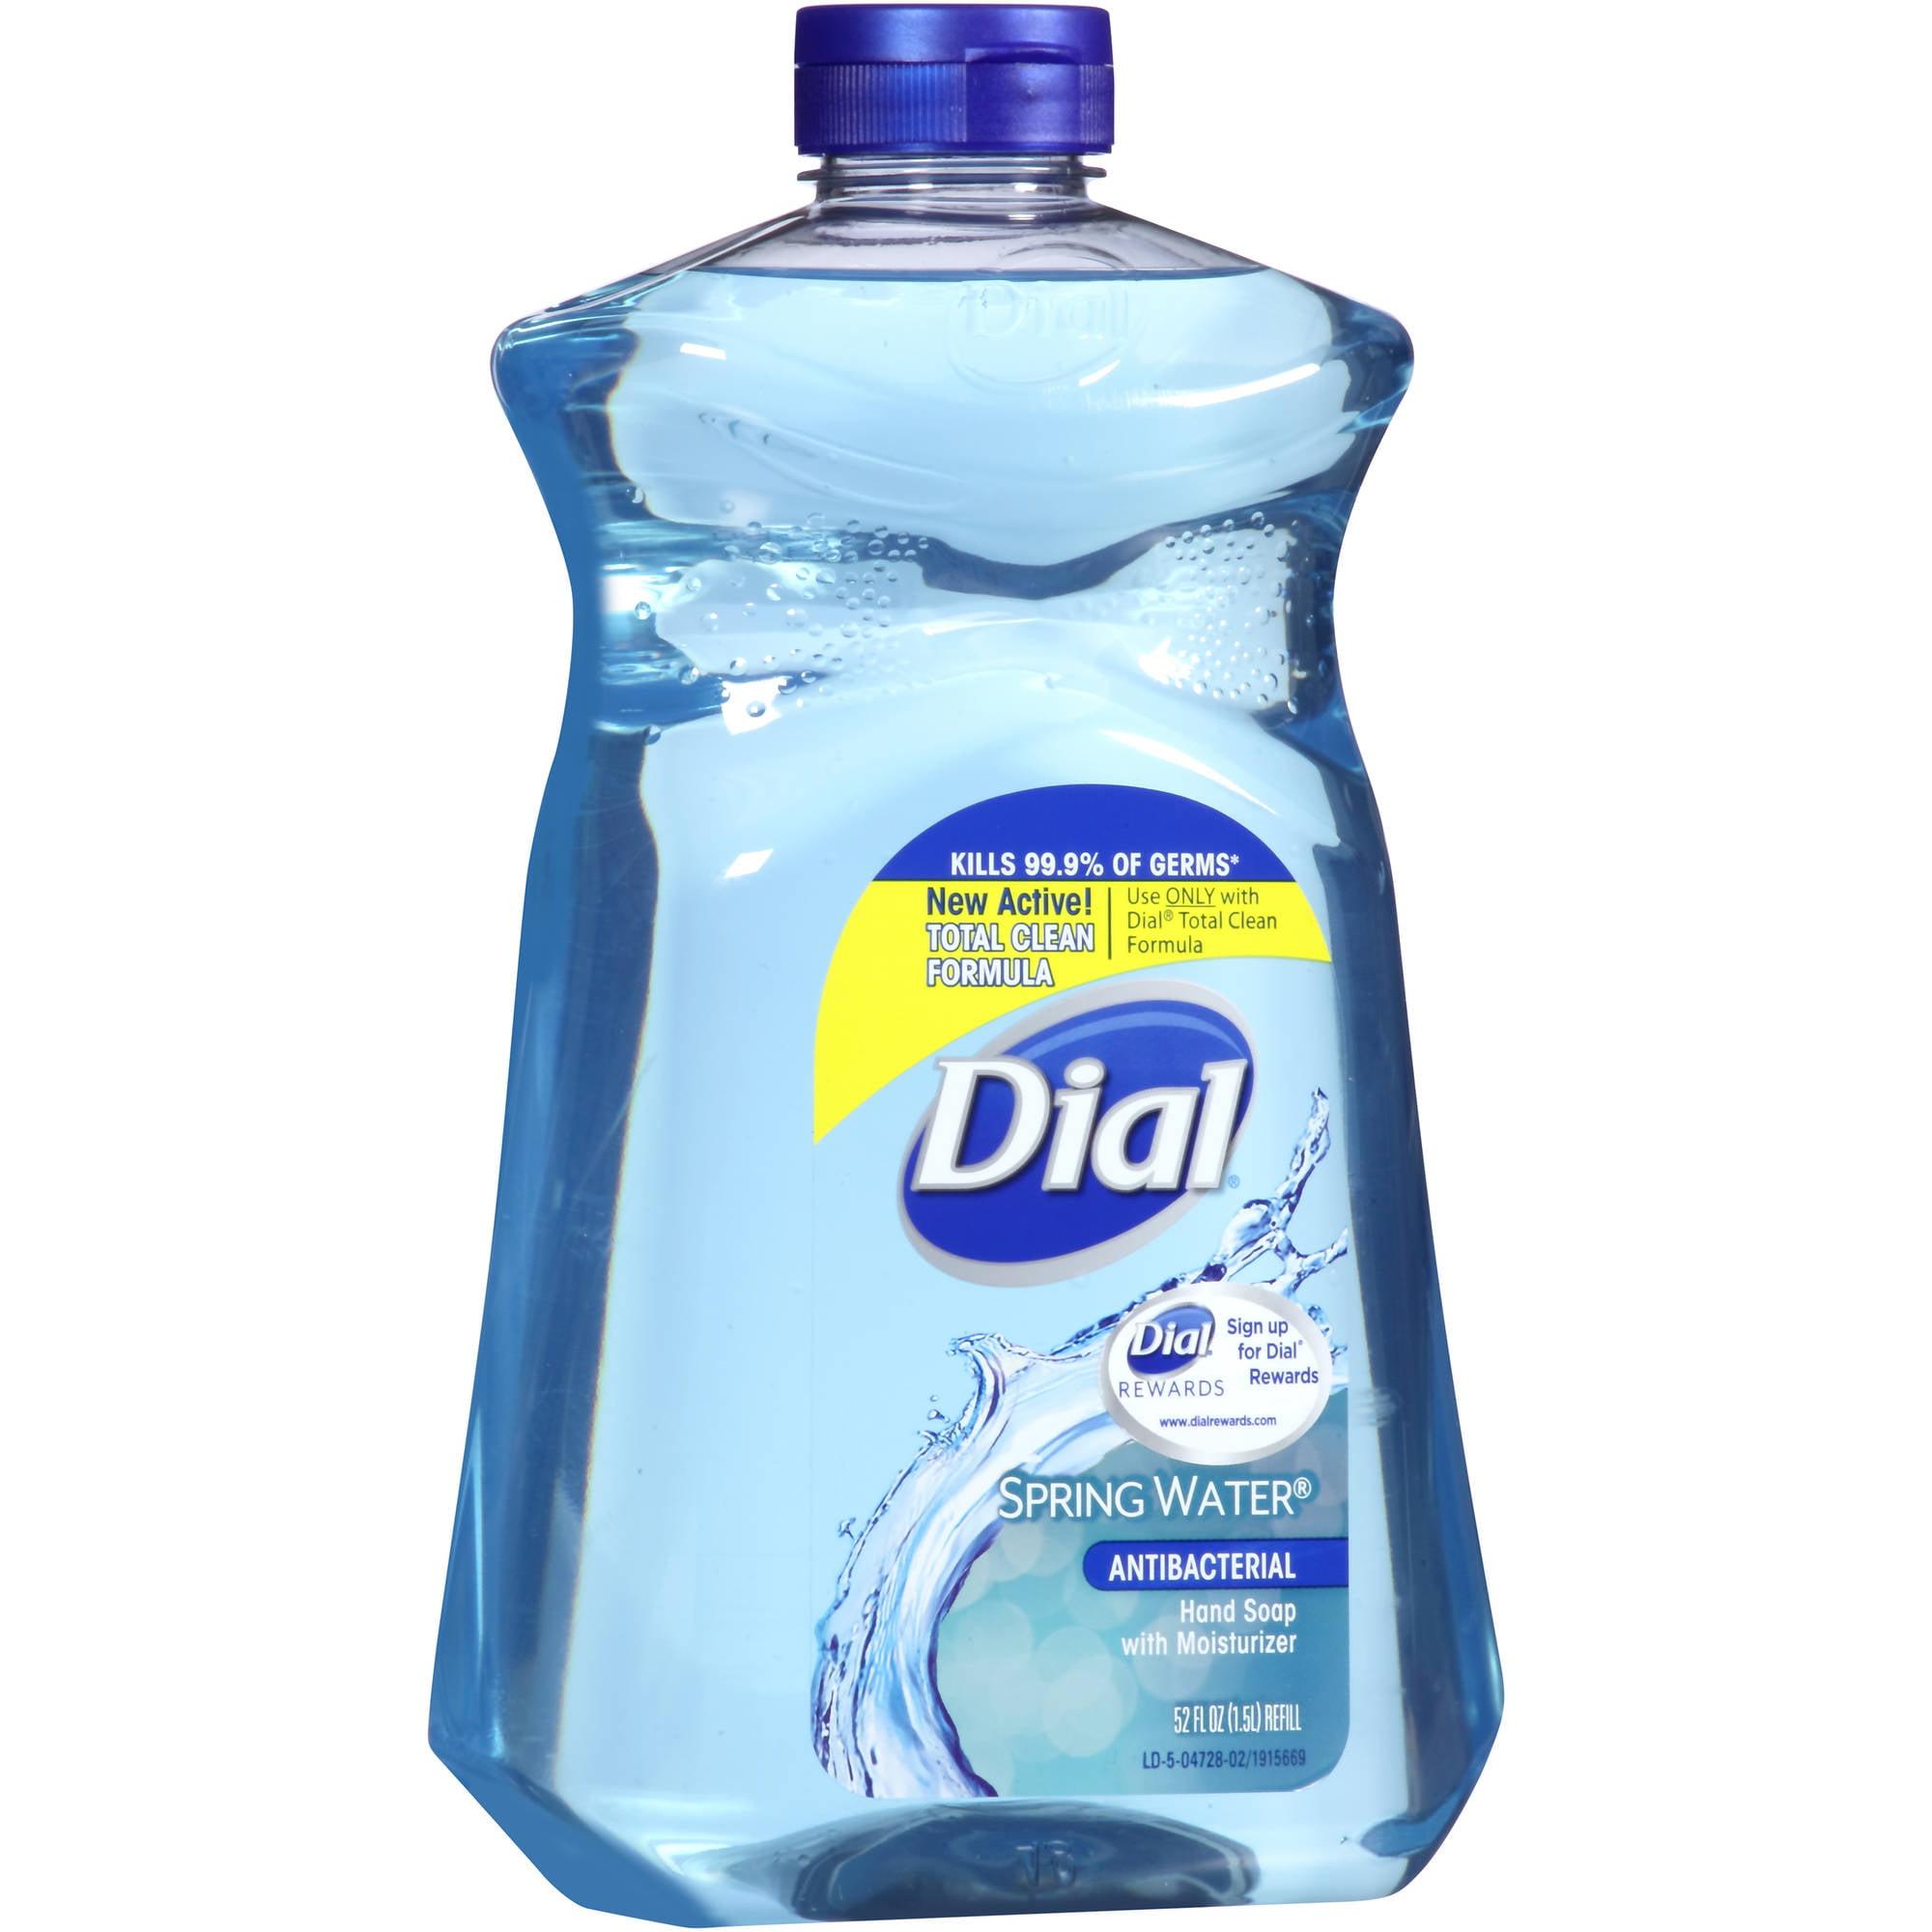 Dial Antibacterial Spring Water Hand Soap, 52 fl oz